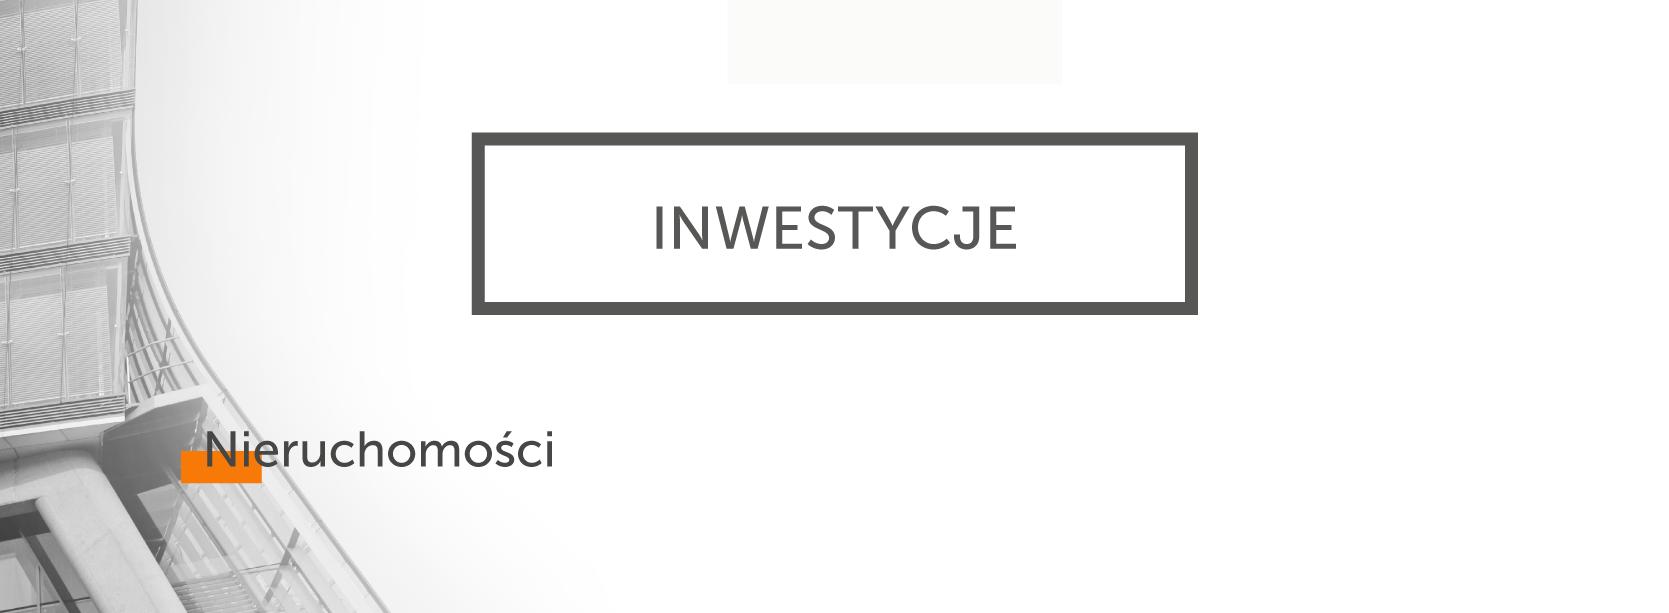 inwestycje-baner-nieruchomosci